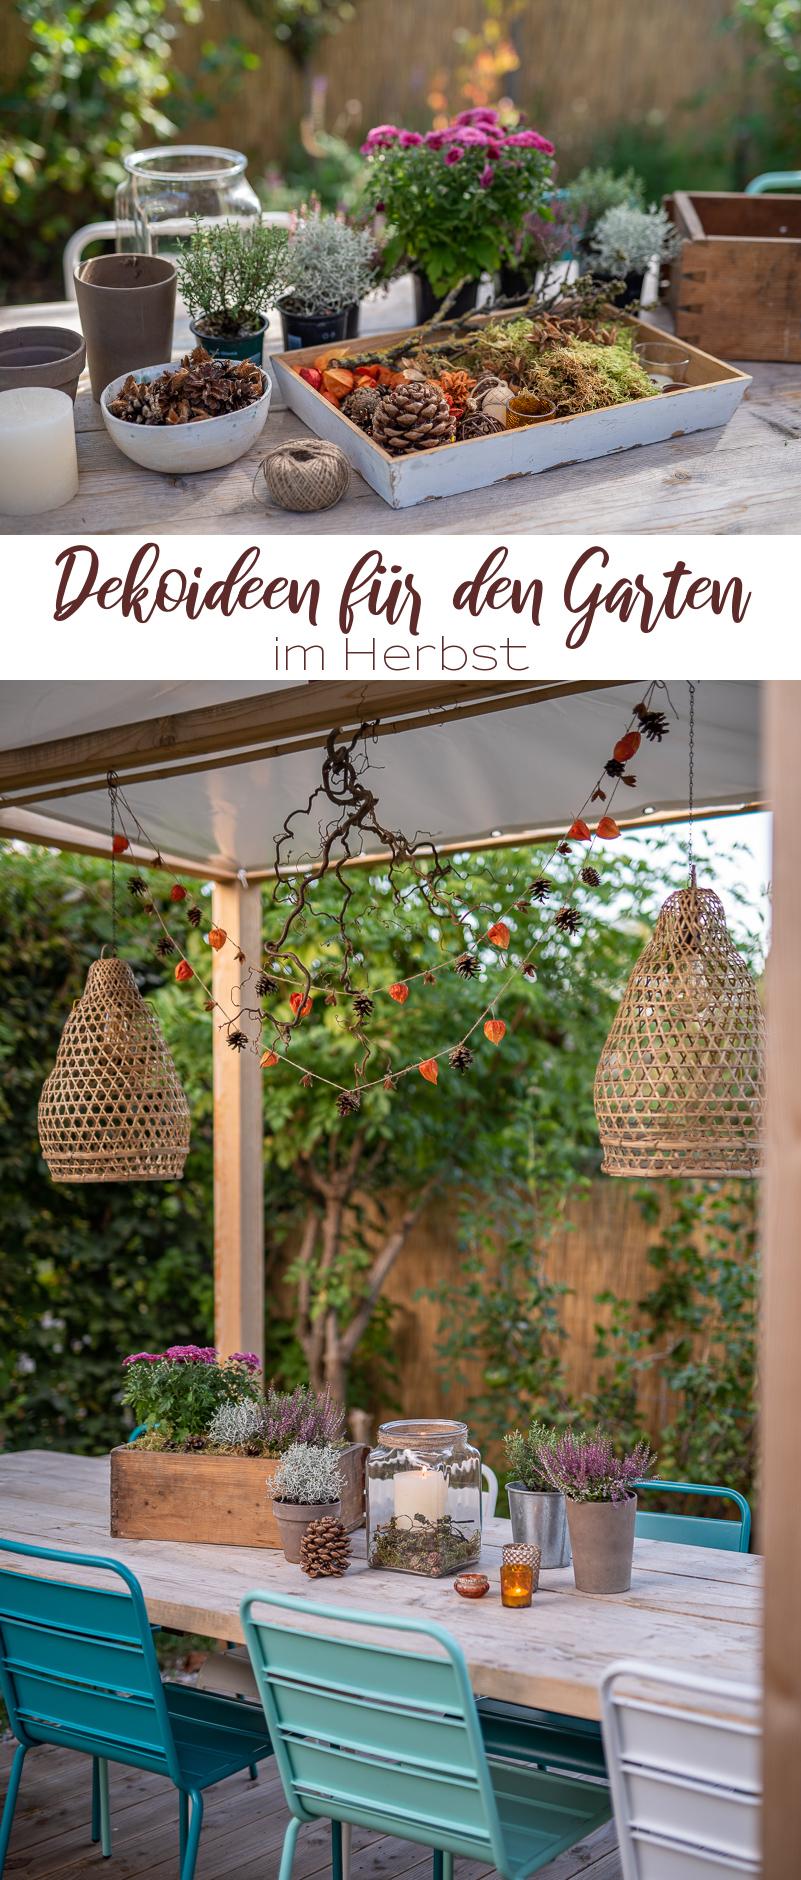 x2019 09 21 DIY Gartendeko Herbst Pflanzen Ideen gespeed ic OXNiffgv3a